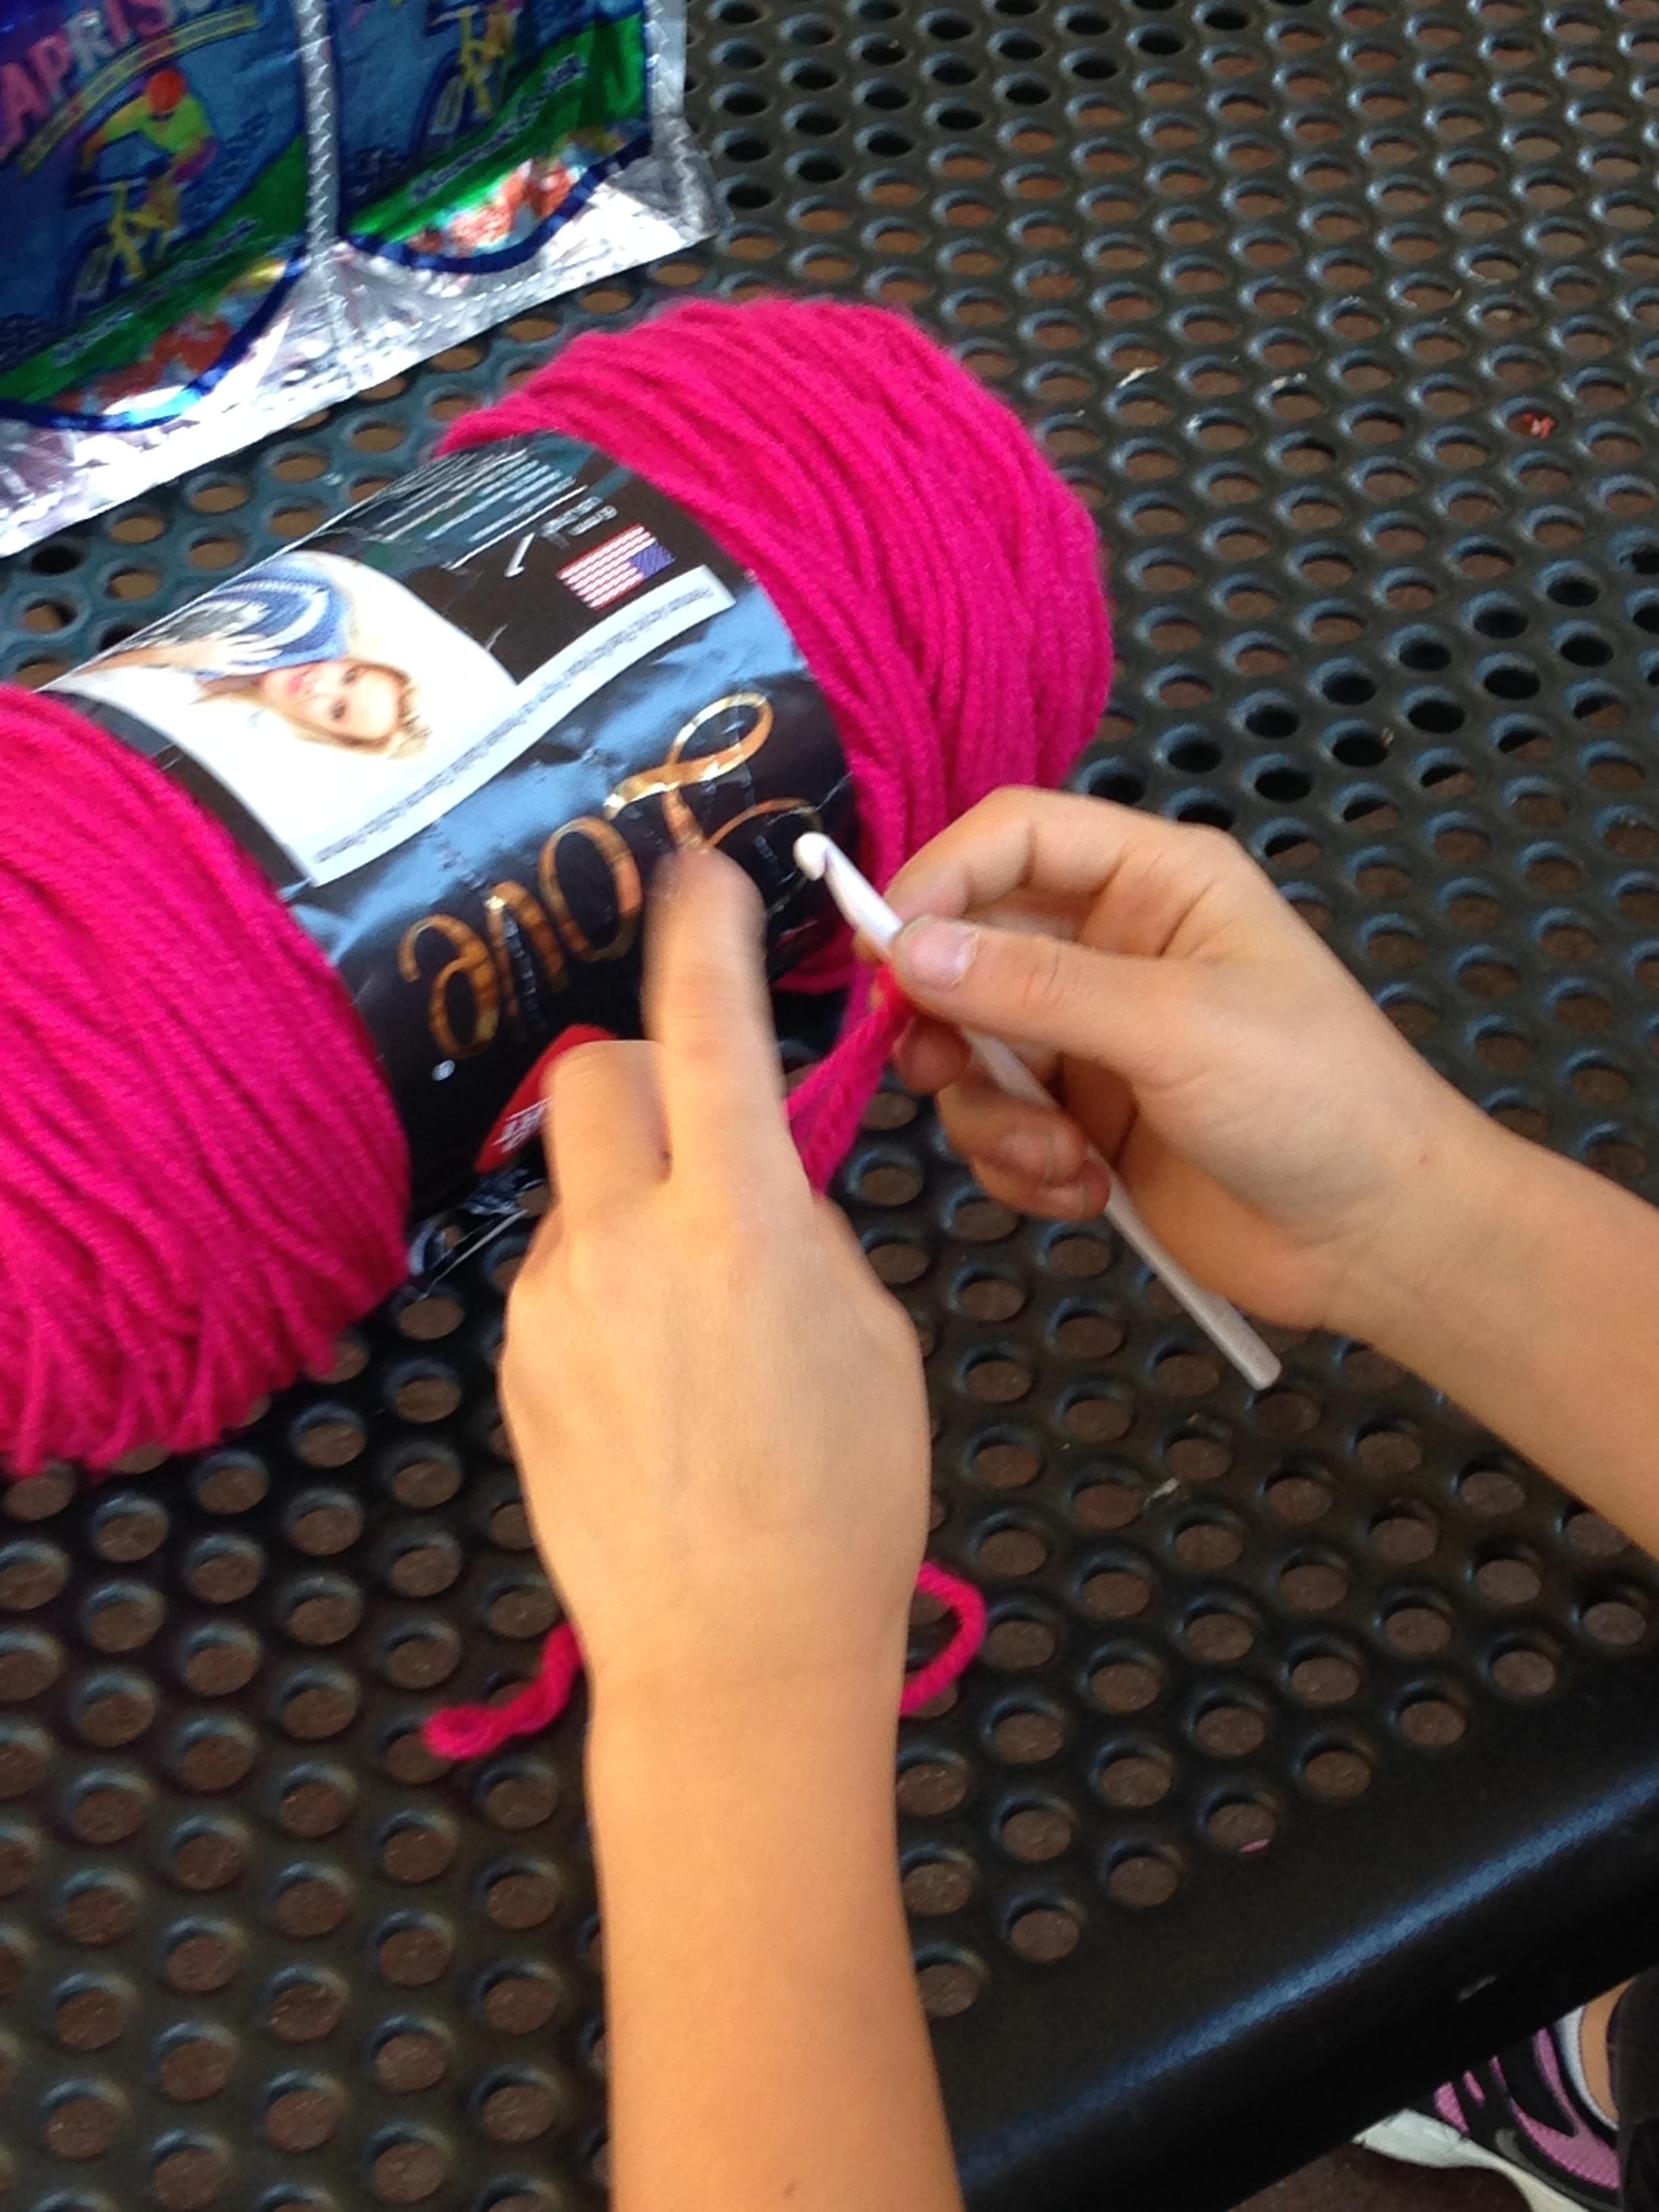 3rd grader learning to crochet.